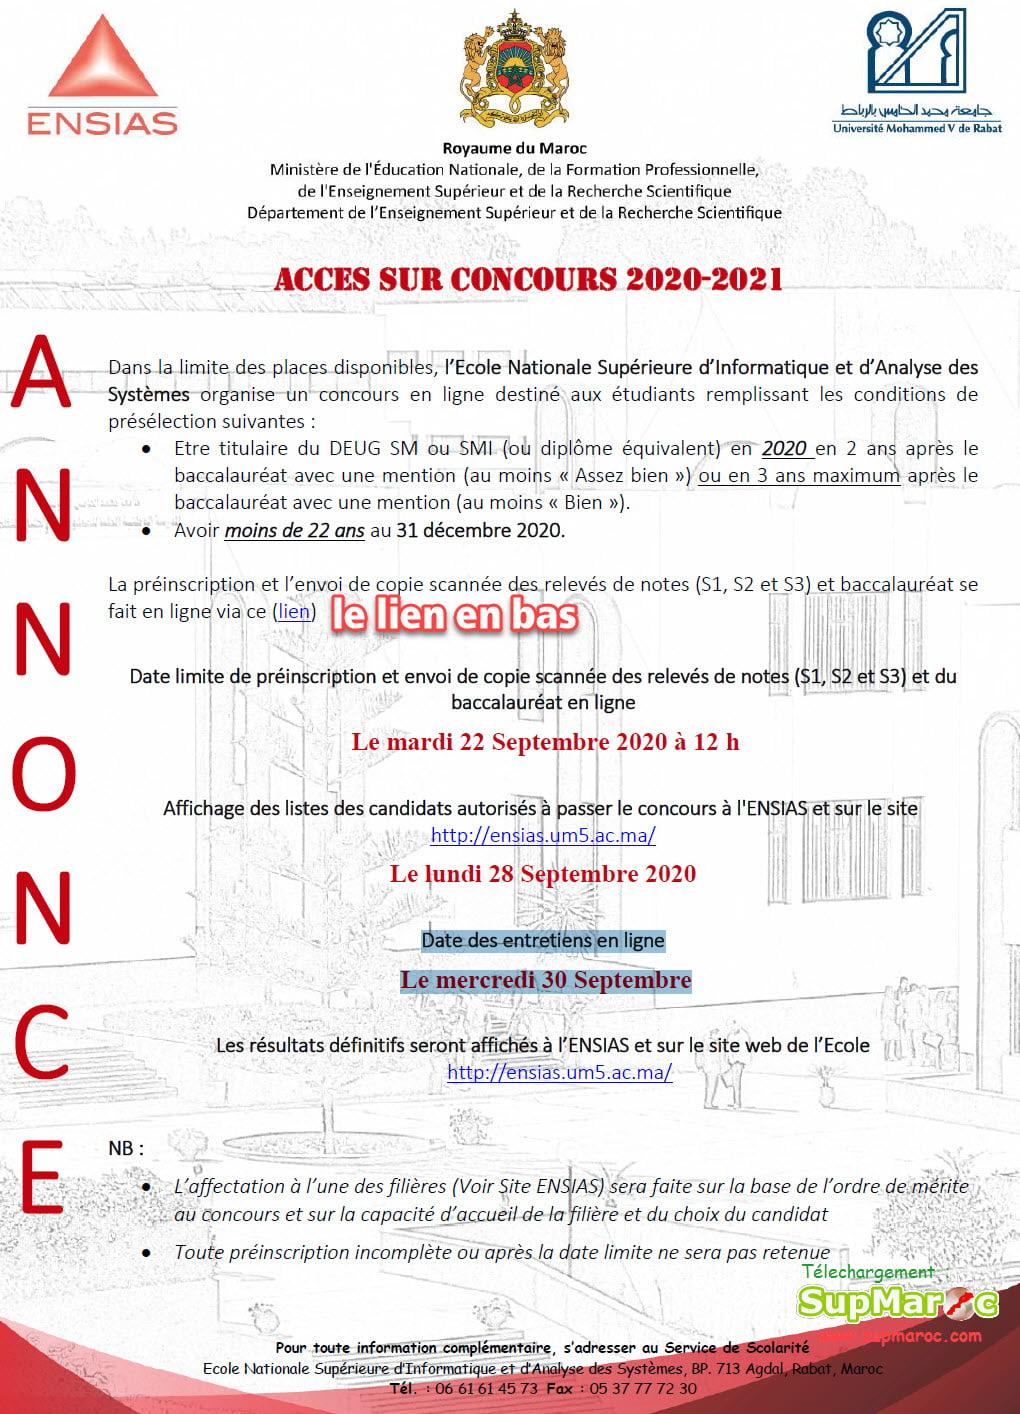 Concours sur Concours ENSIAS DEUG Rabat 2020 2021